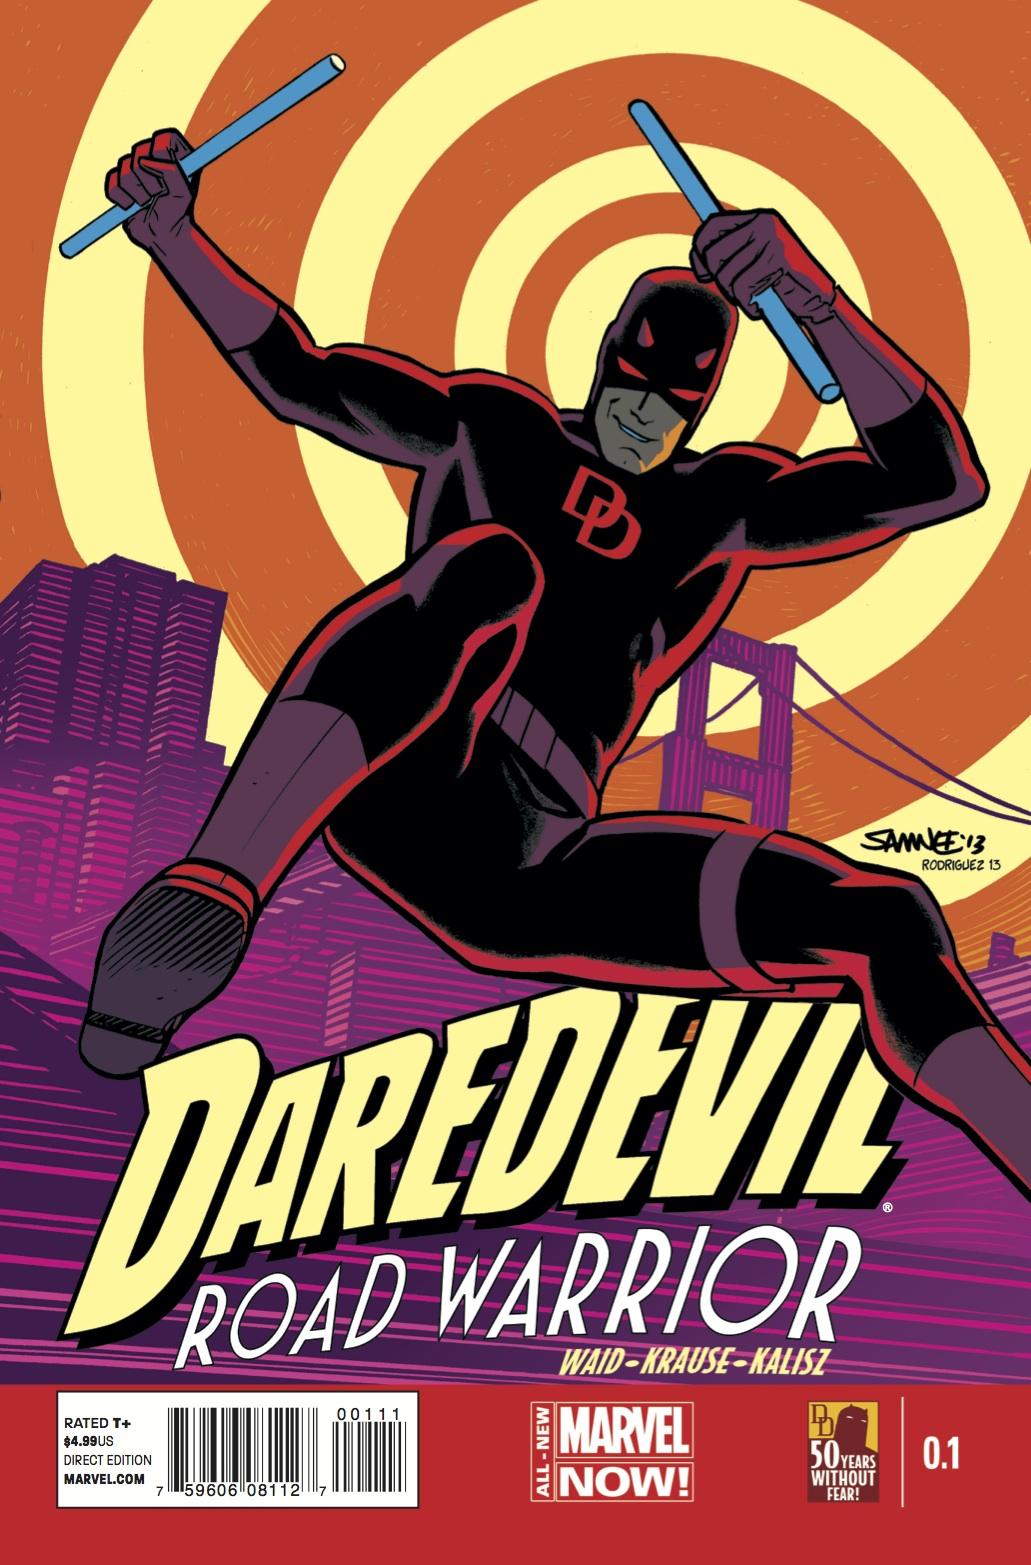 Michael Allred Daredevil